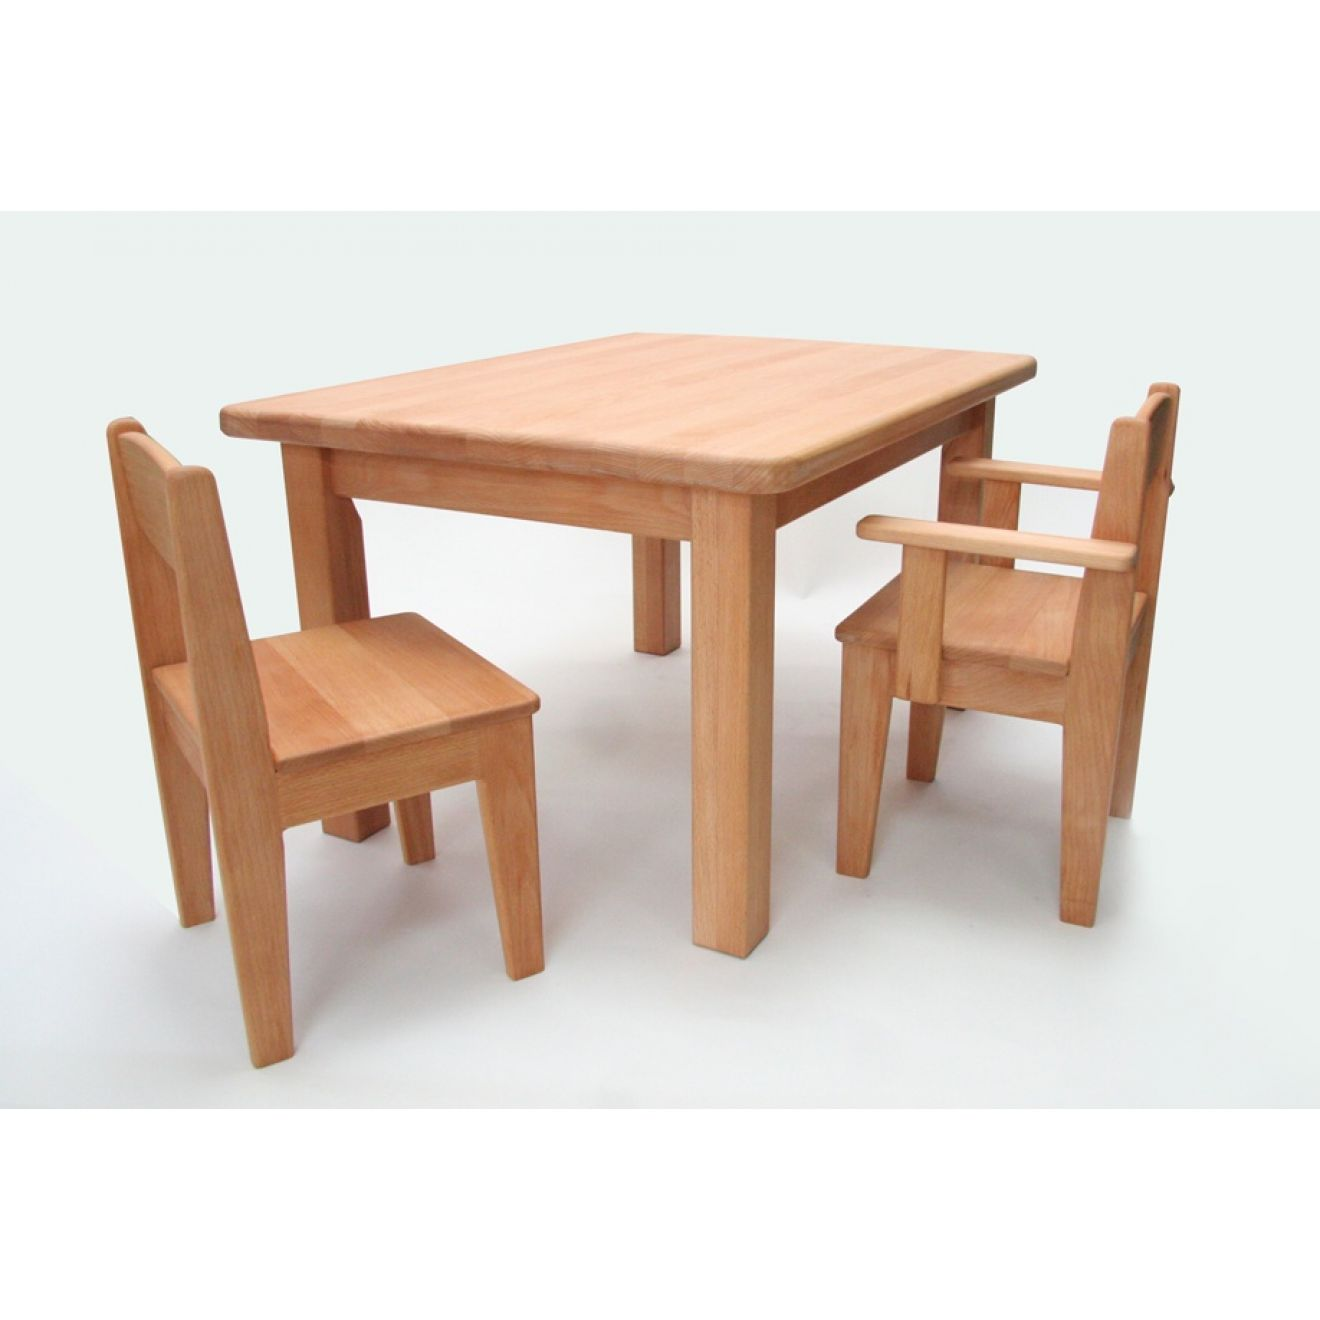 Kinderstuhl Holz Buche geölt Sitzhöhe 26 cm (Tisch ...